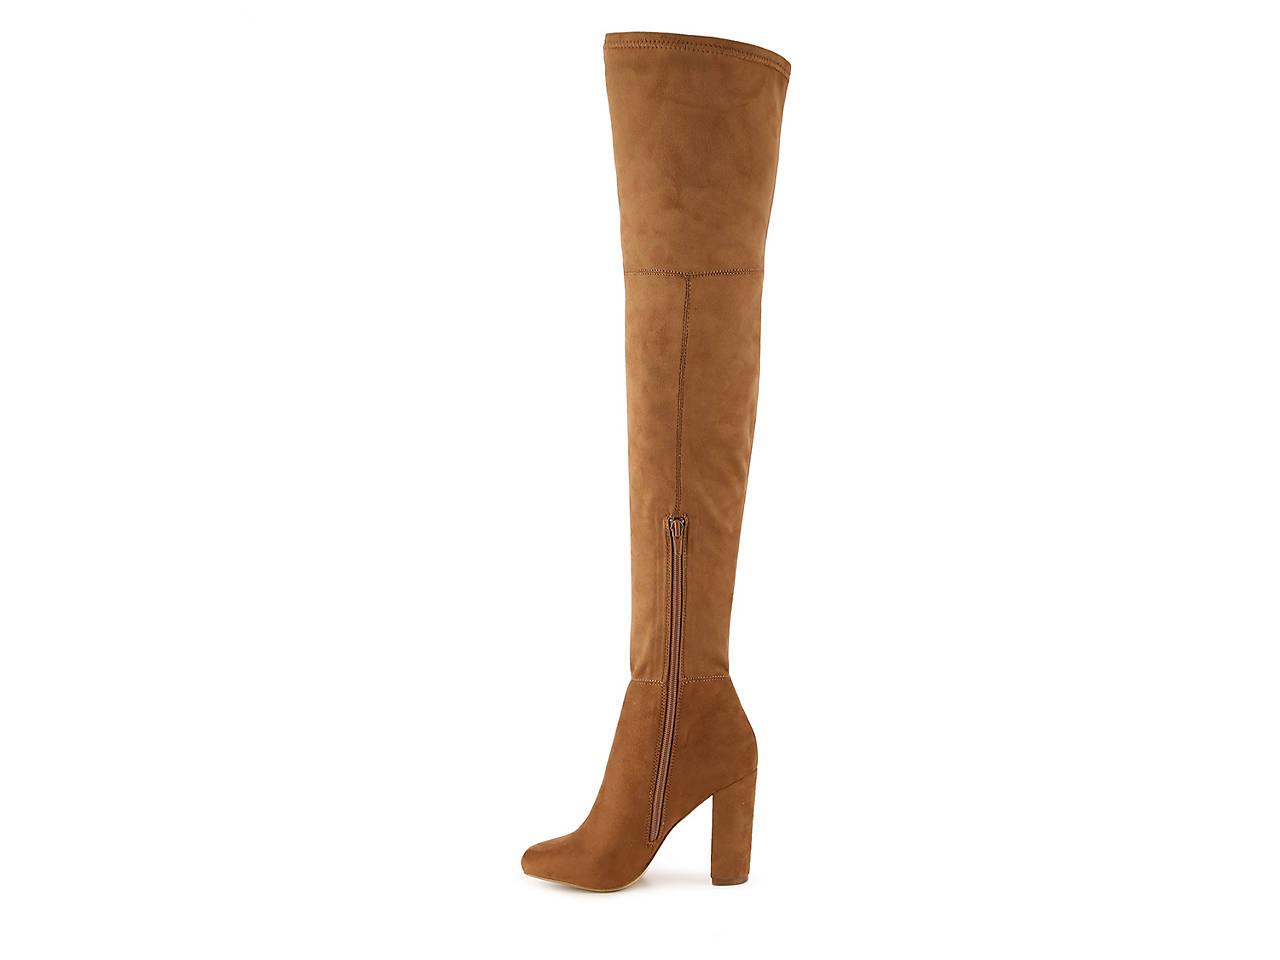 1b52f4f4c5f Aldo Steinar Over The Knee Boot Women s Shoes